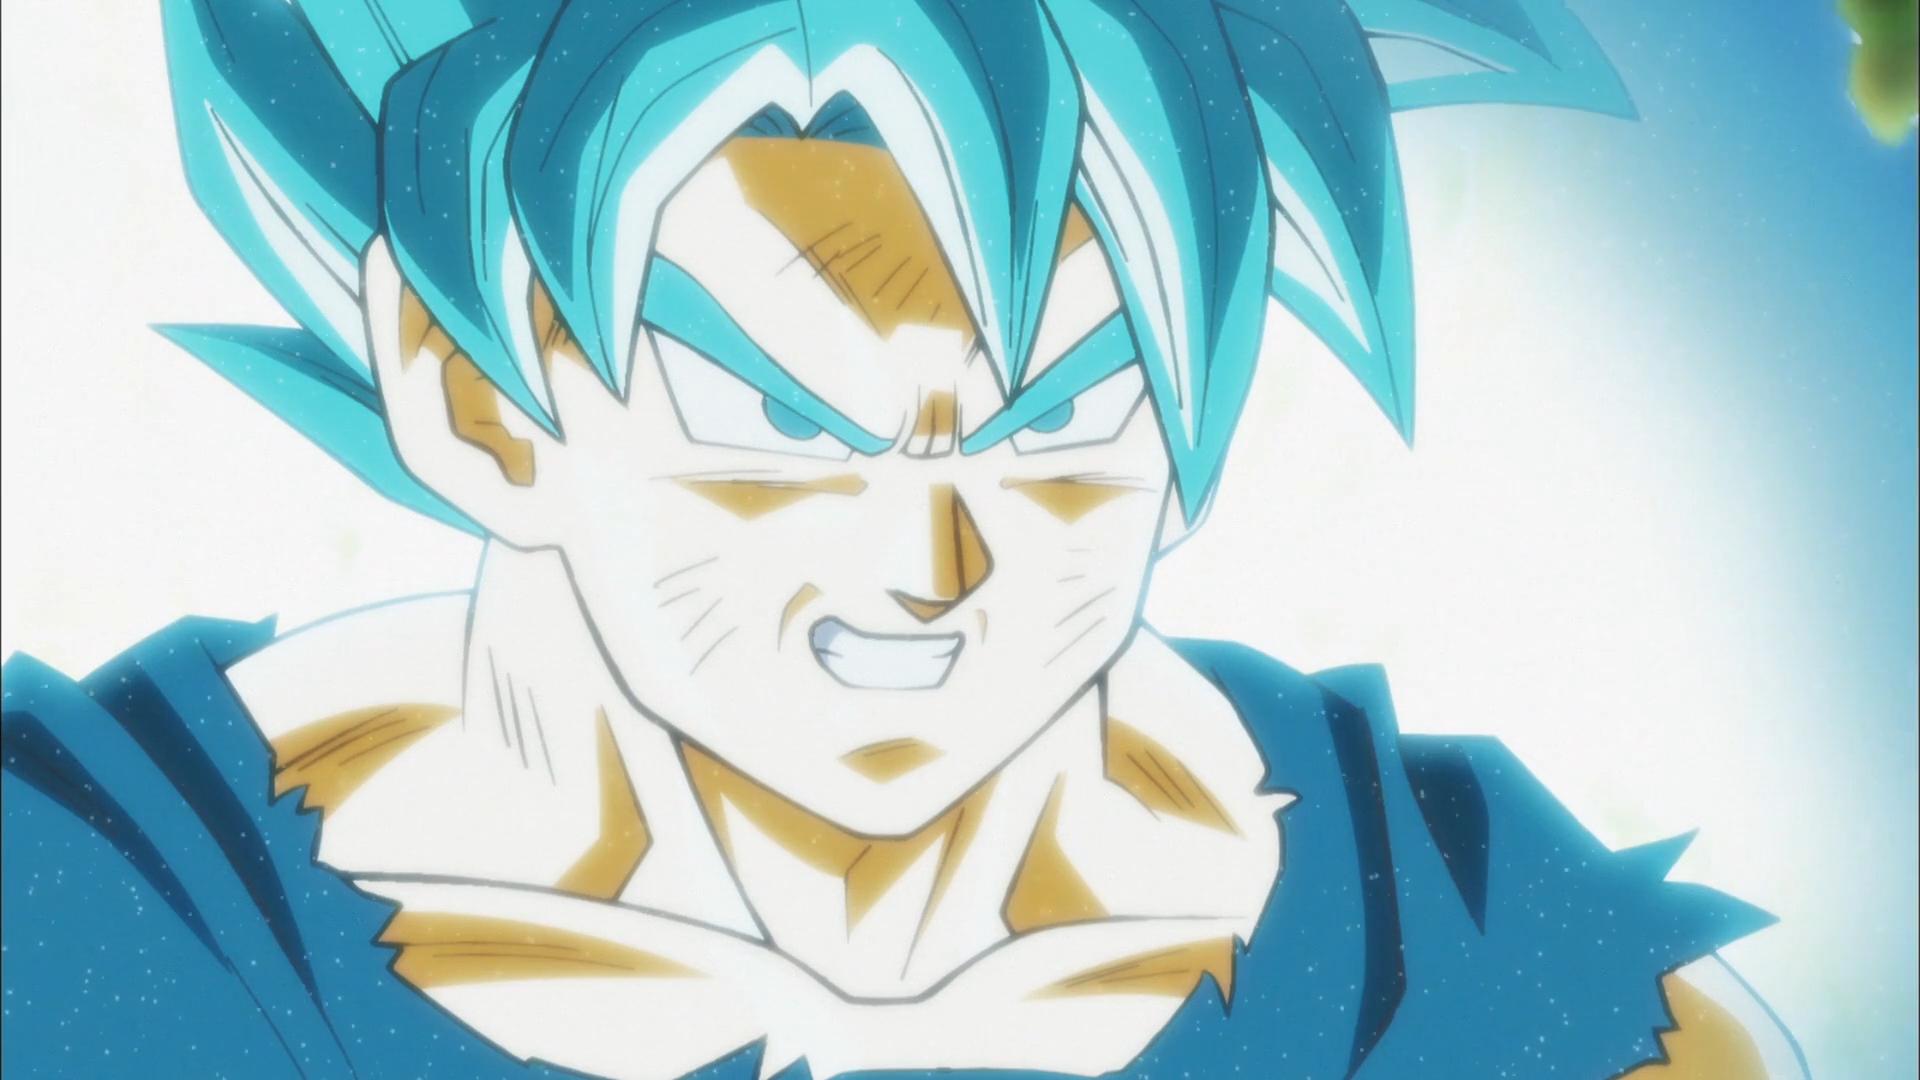 Anime - Dragon Ball Super  Goku Super Saiyan Blue Wallpaper